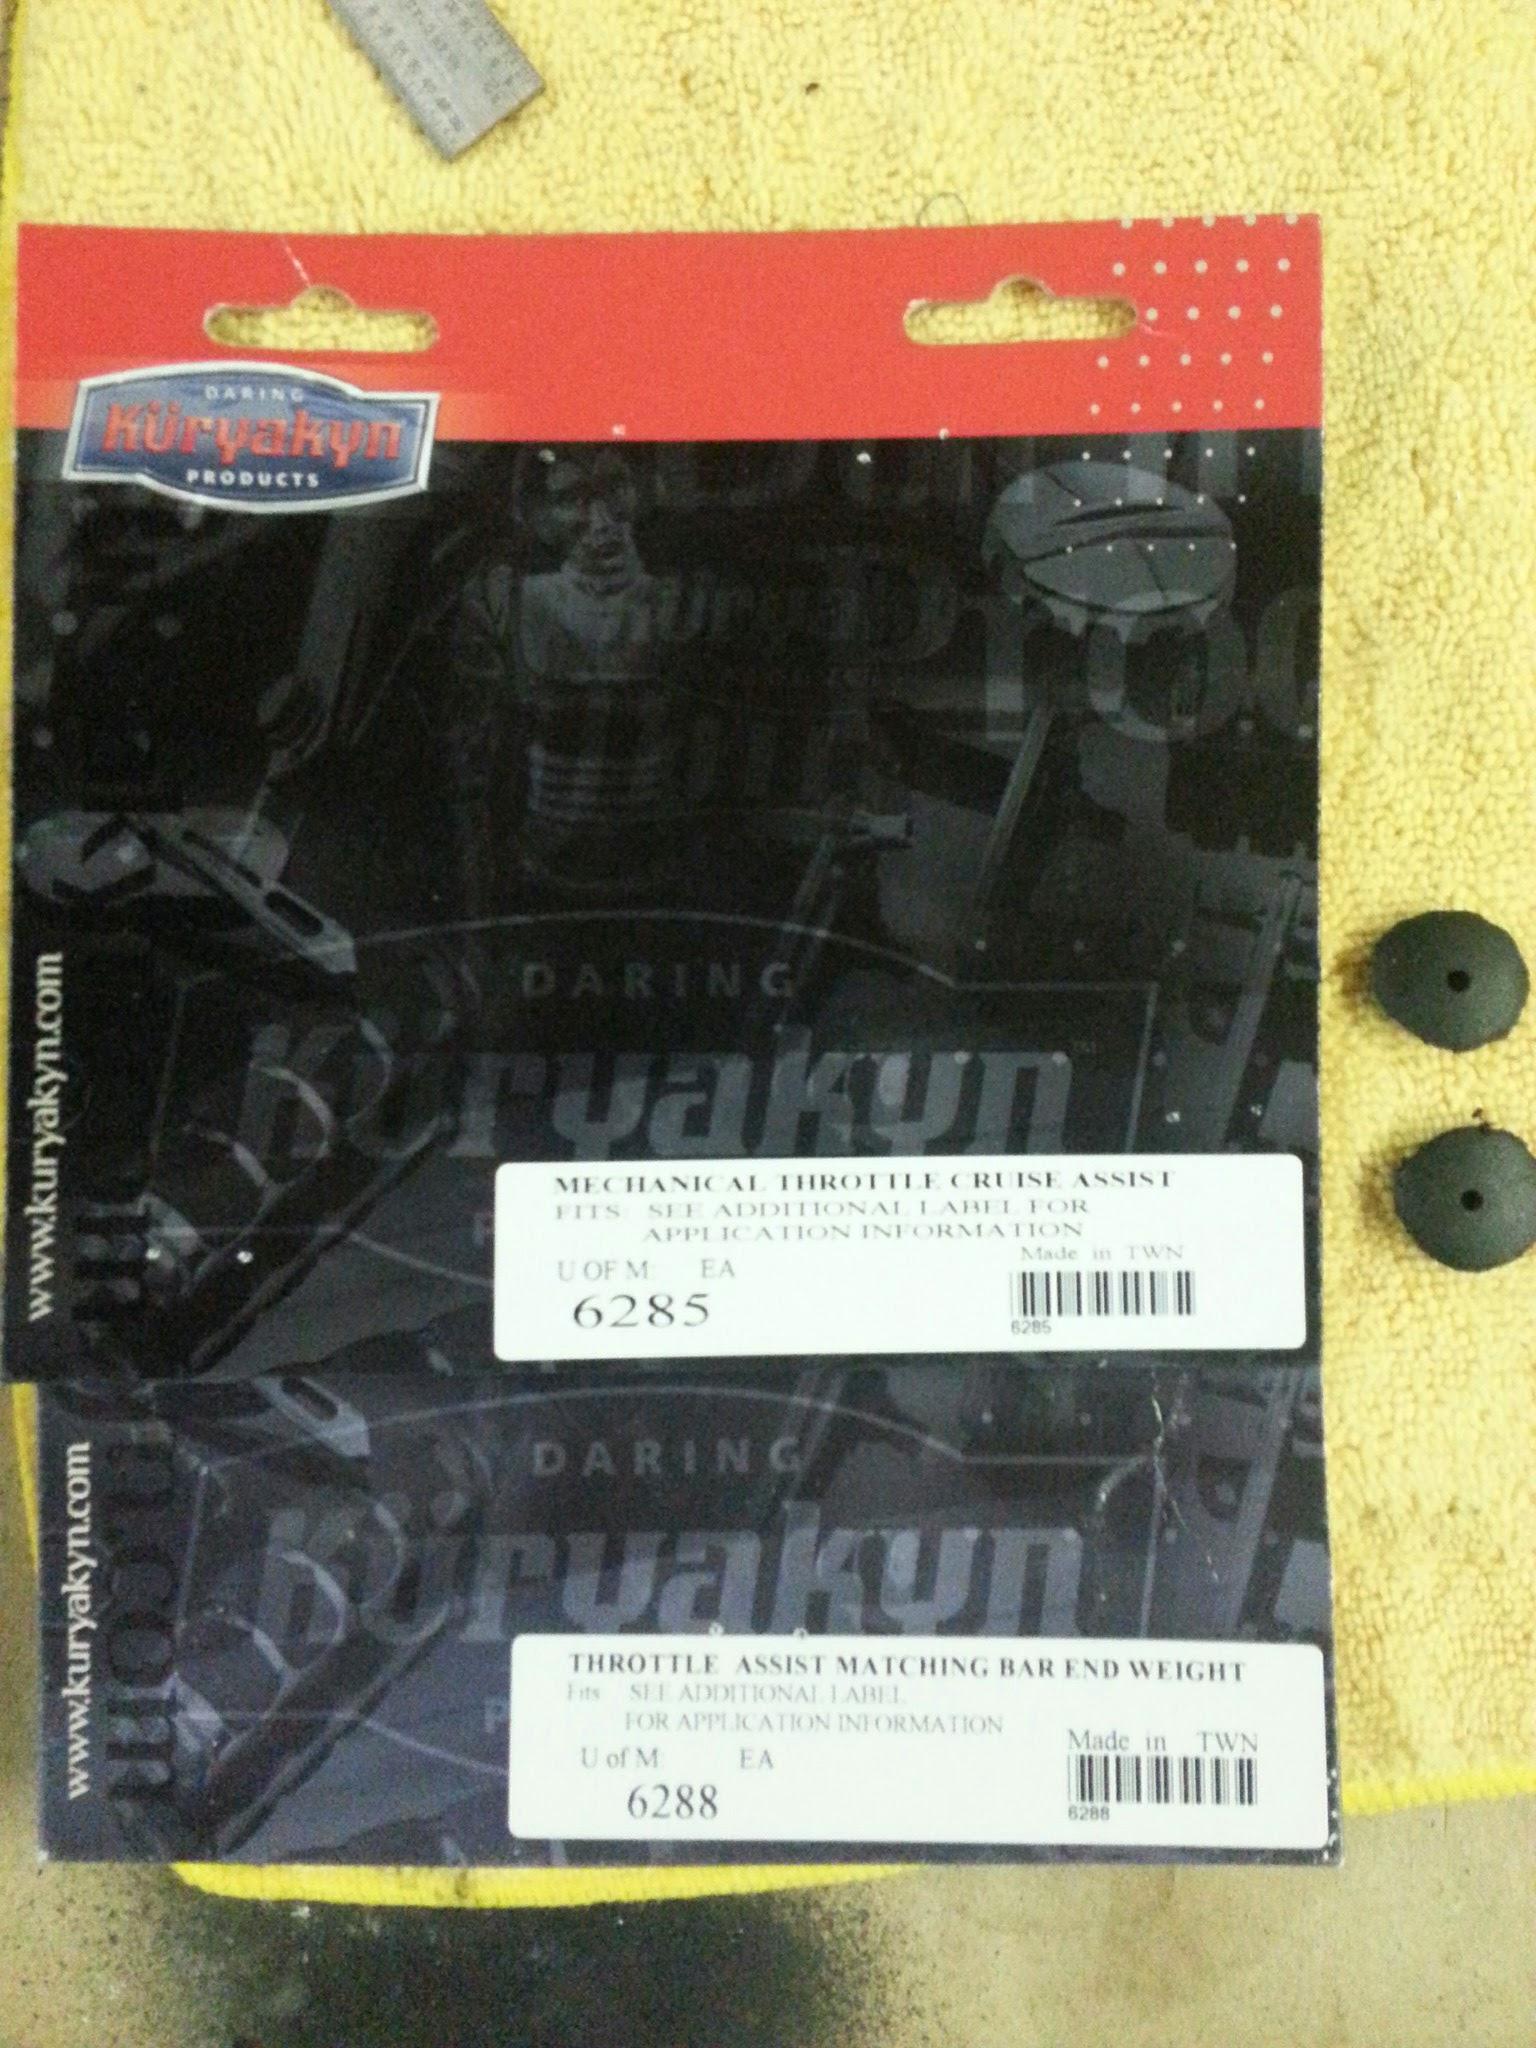 Kuryakyn 6285 Mechanical Throttle Cruise Assist